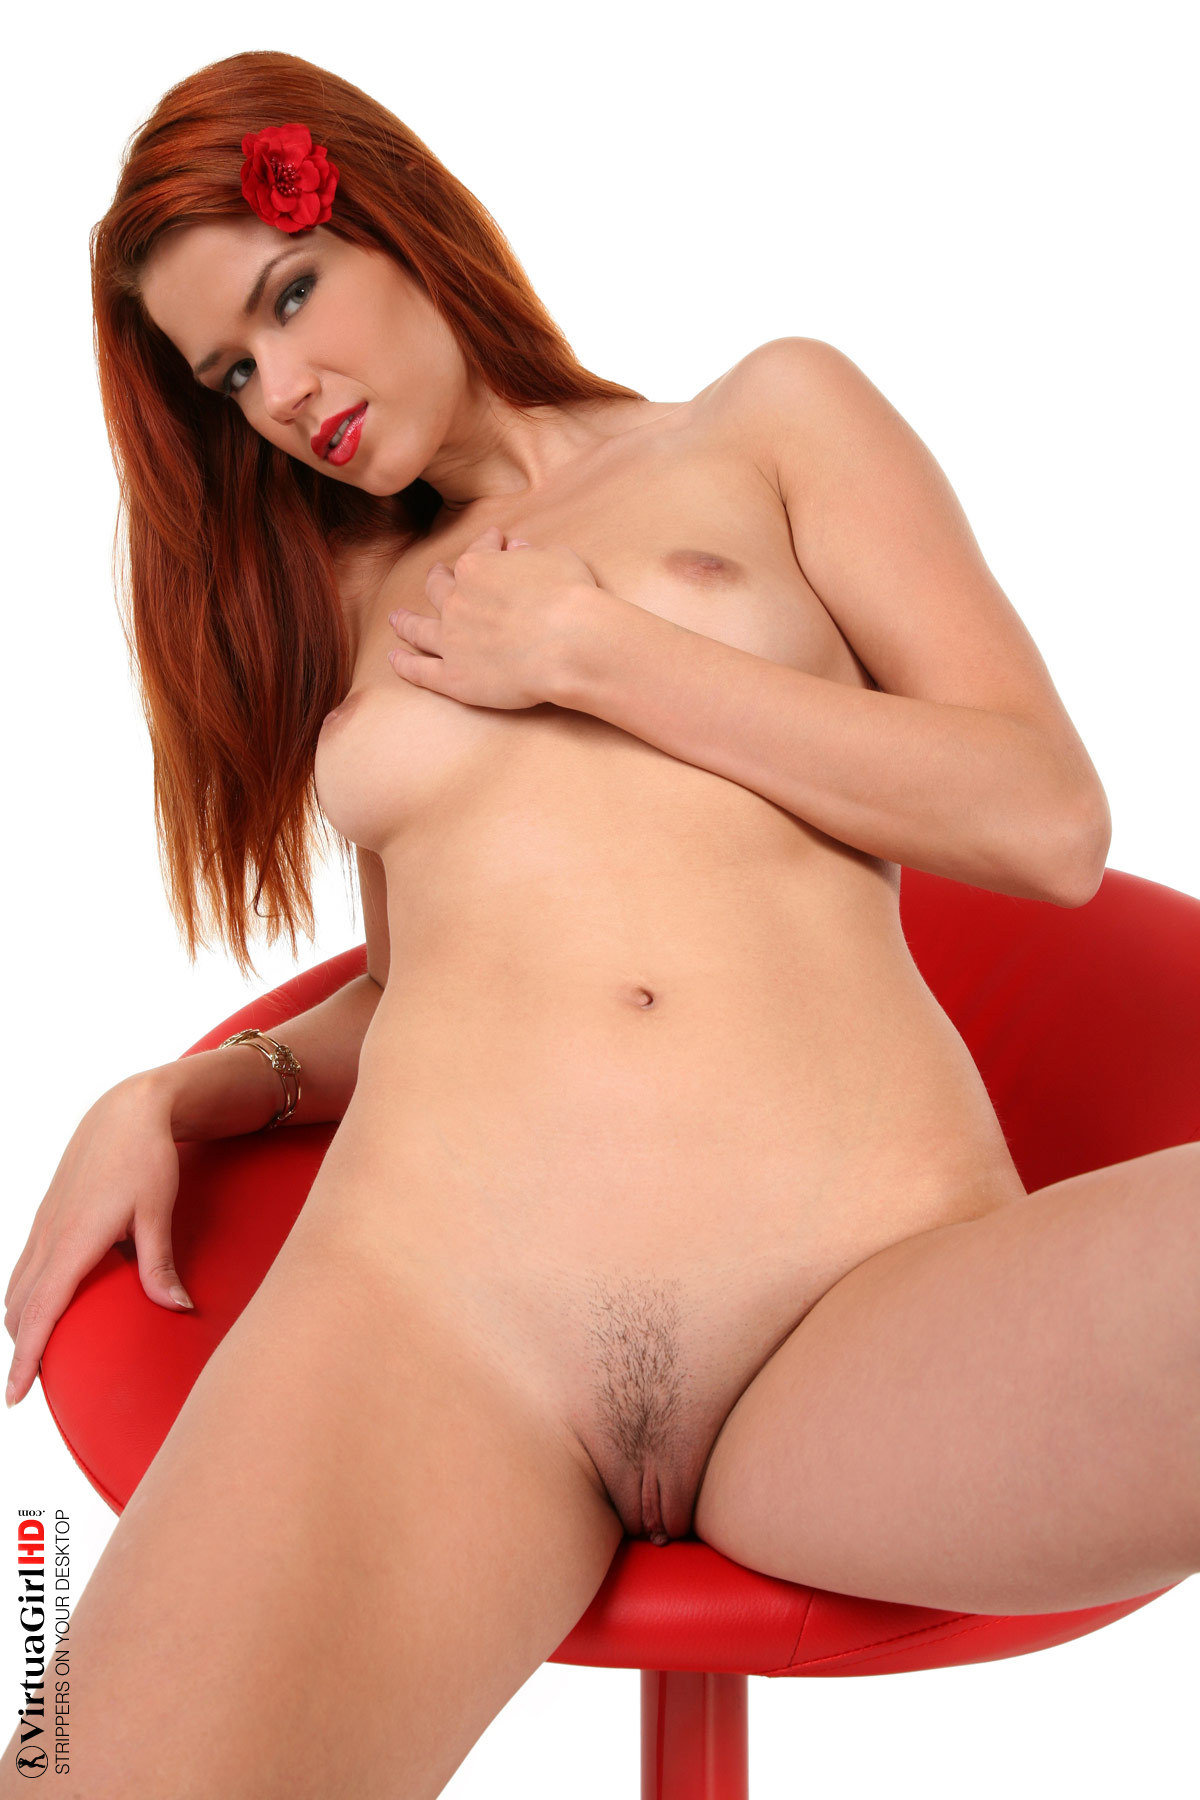 girls stripping nacked